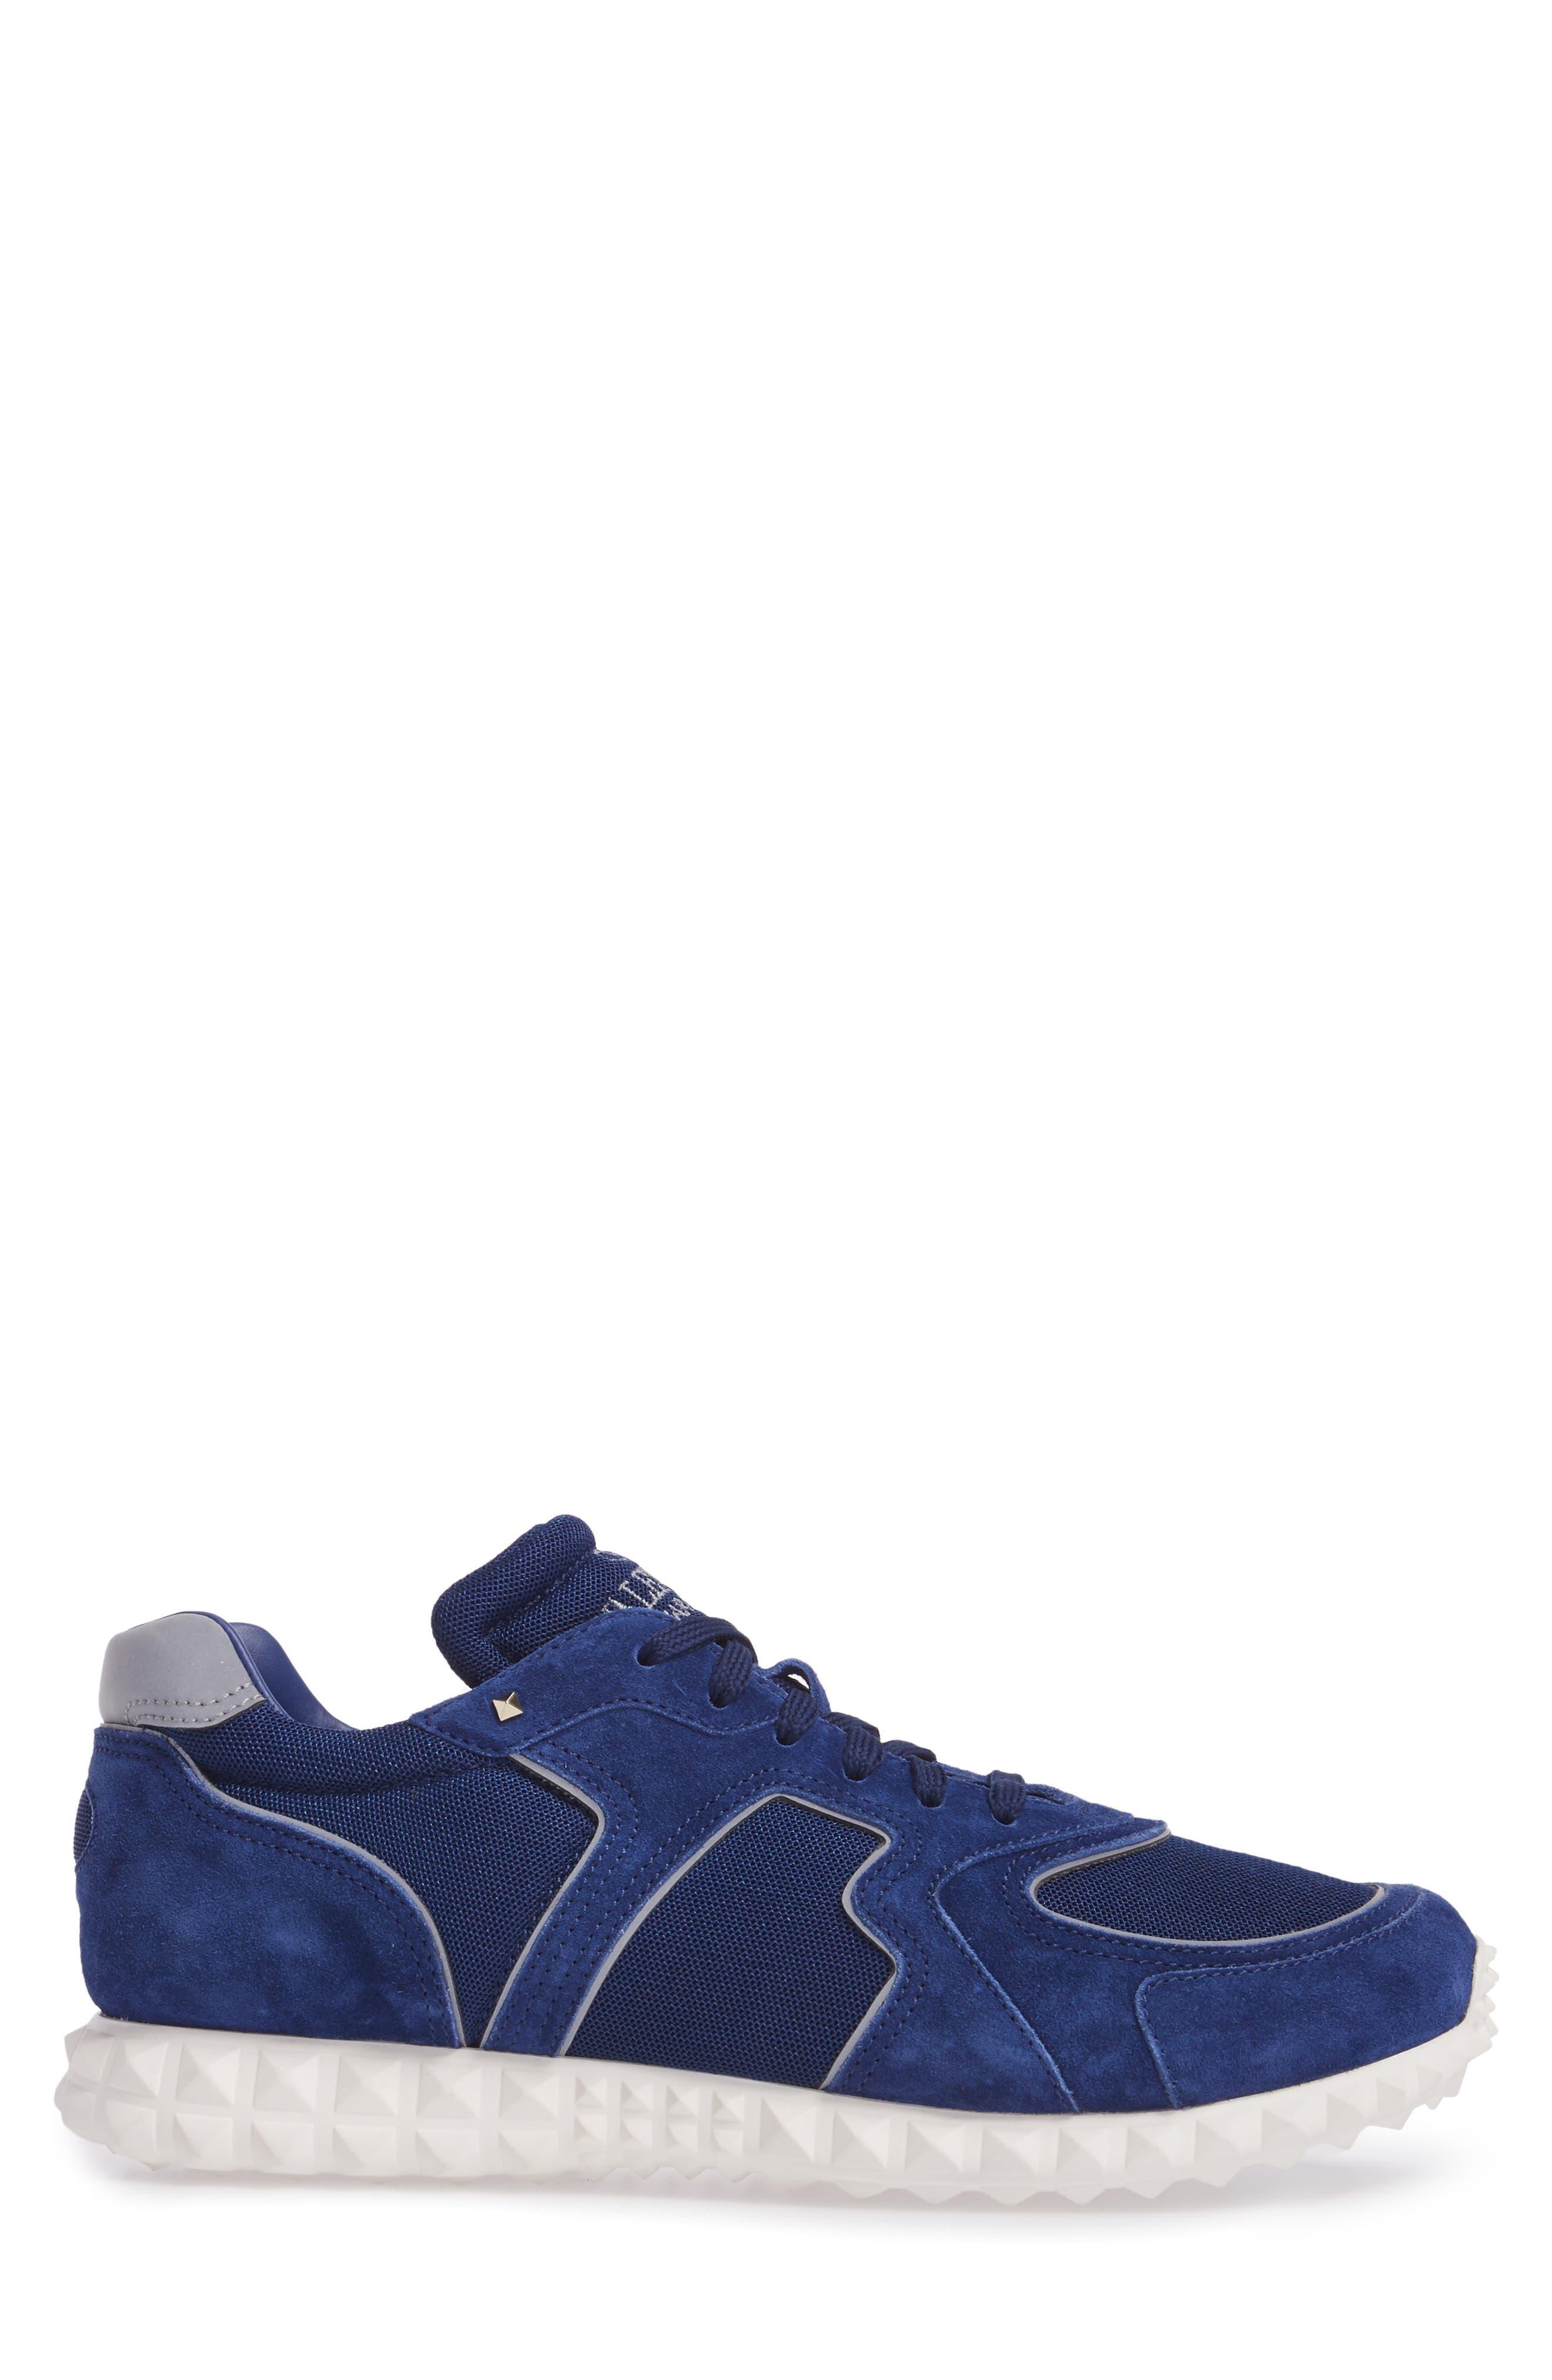 Soul AM Sneaker,                             Alternate thumbnail 3, color,                             Blue Royal/ Blue Royal